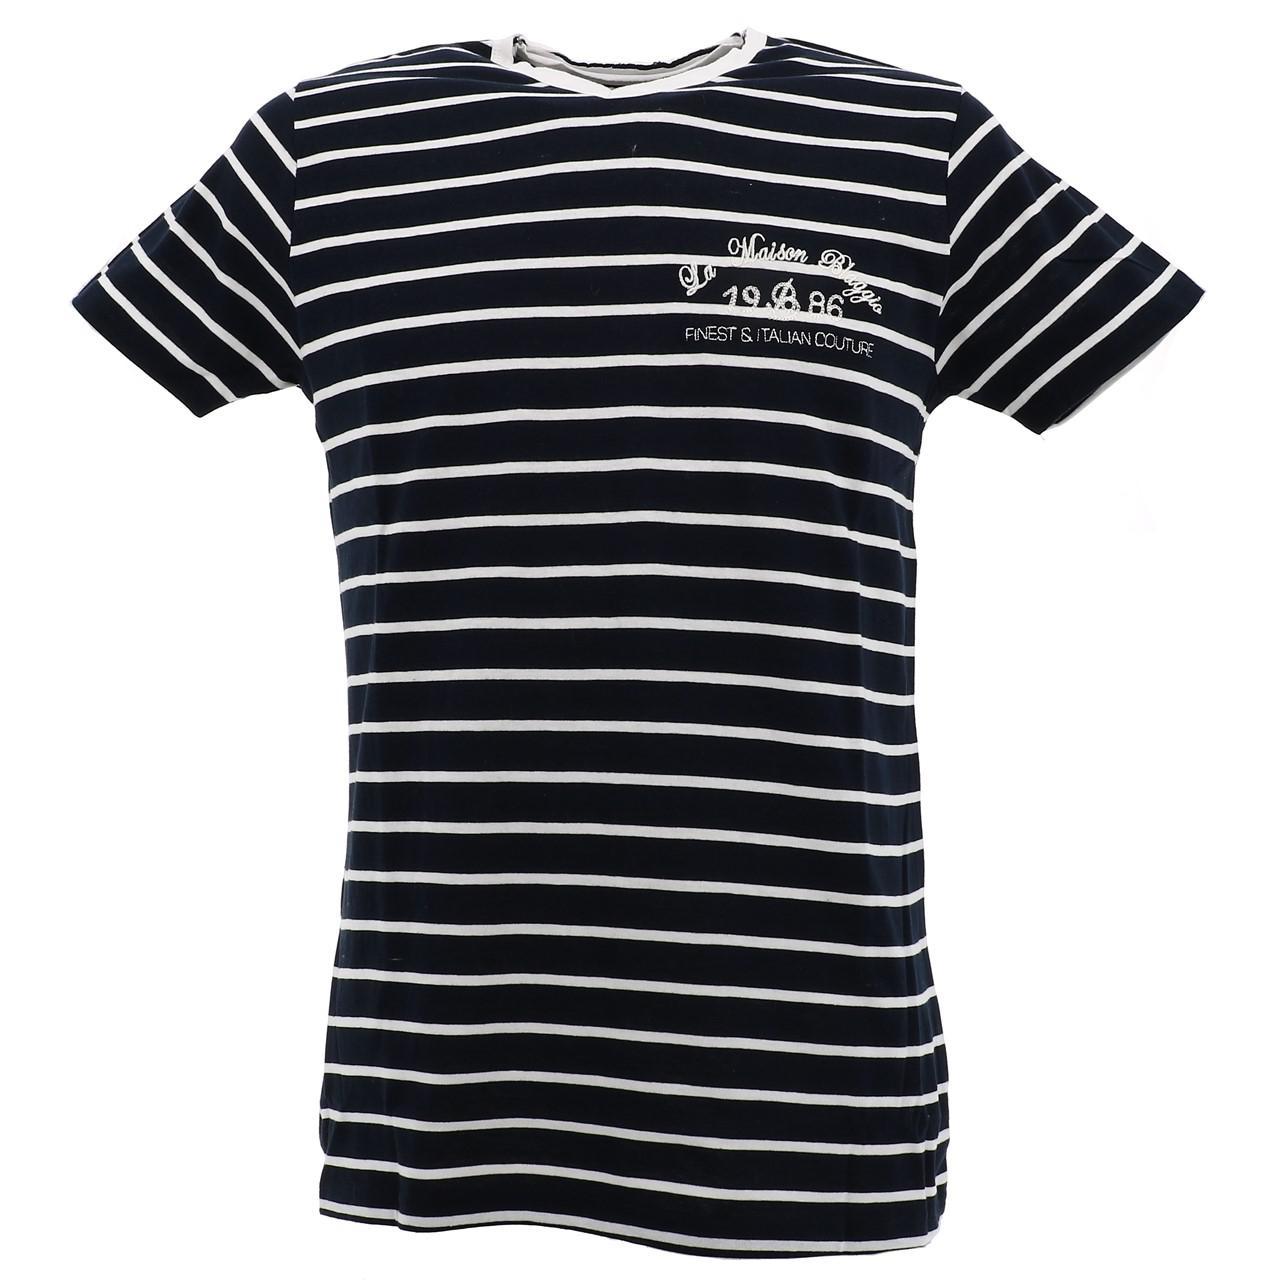 Short-Sleeve-T-Shirt-La-Maison-Blaggio-Mavili-Navy-Wht-Mc-Tee-Blue-27335